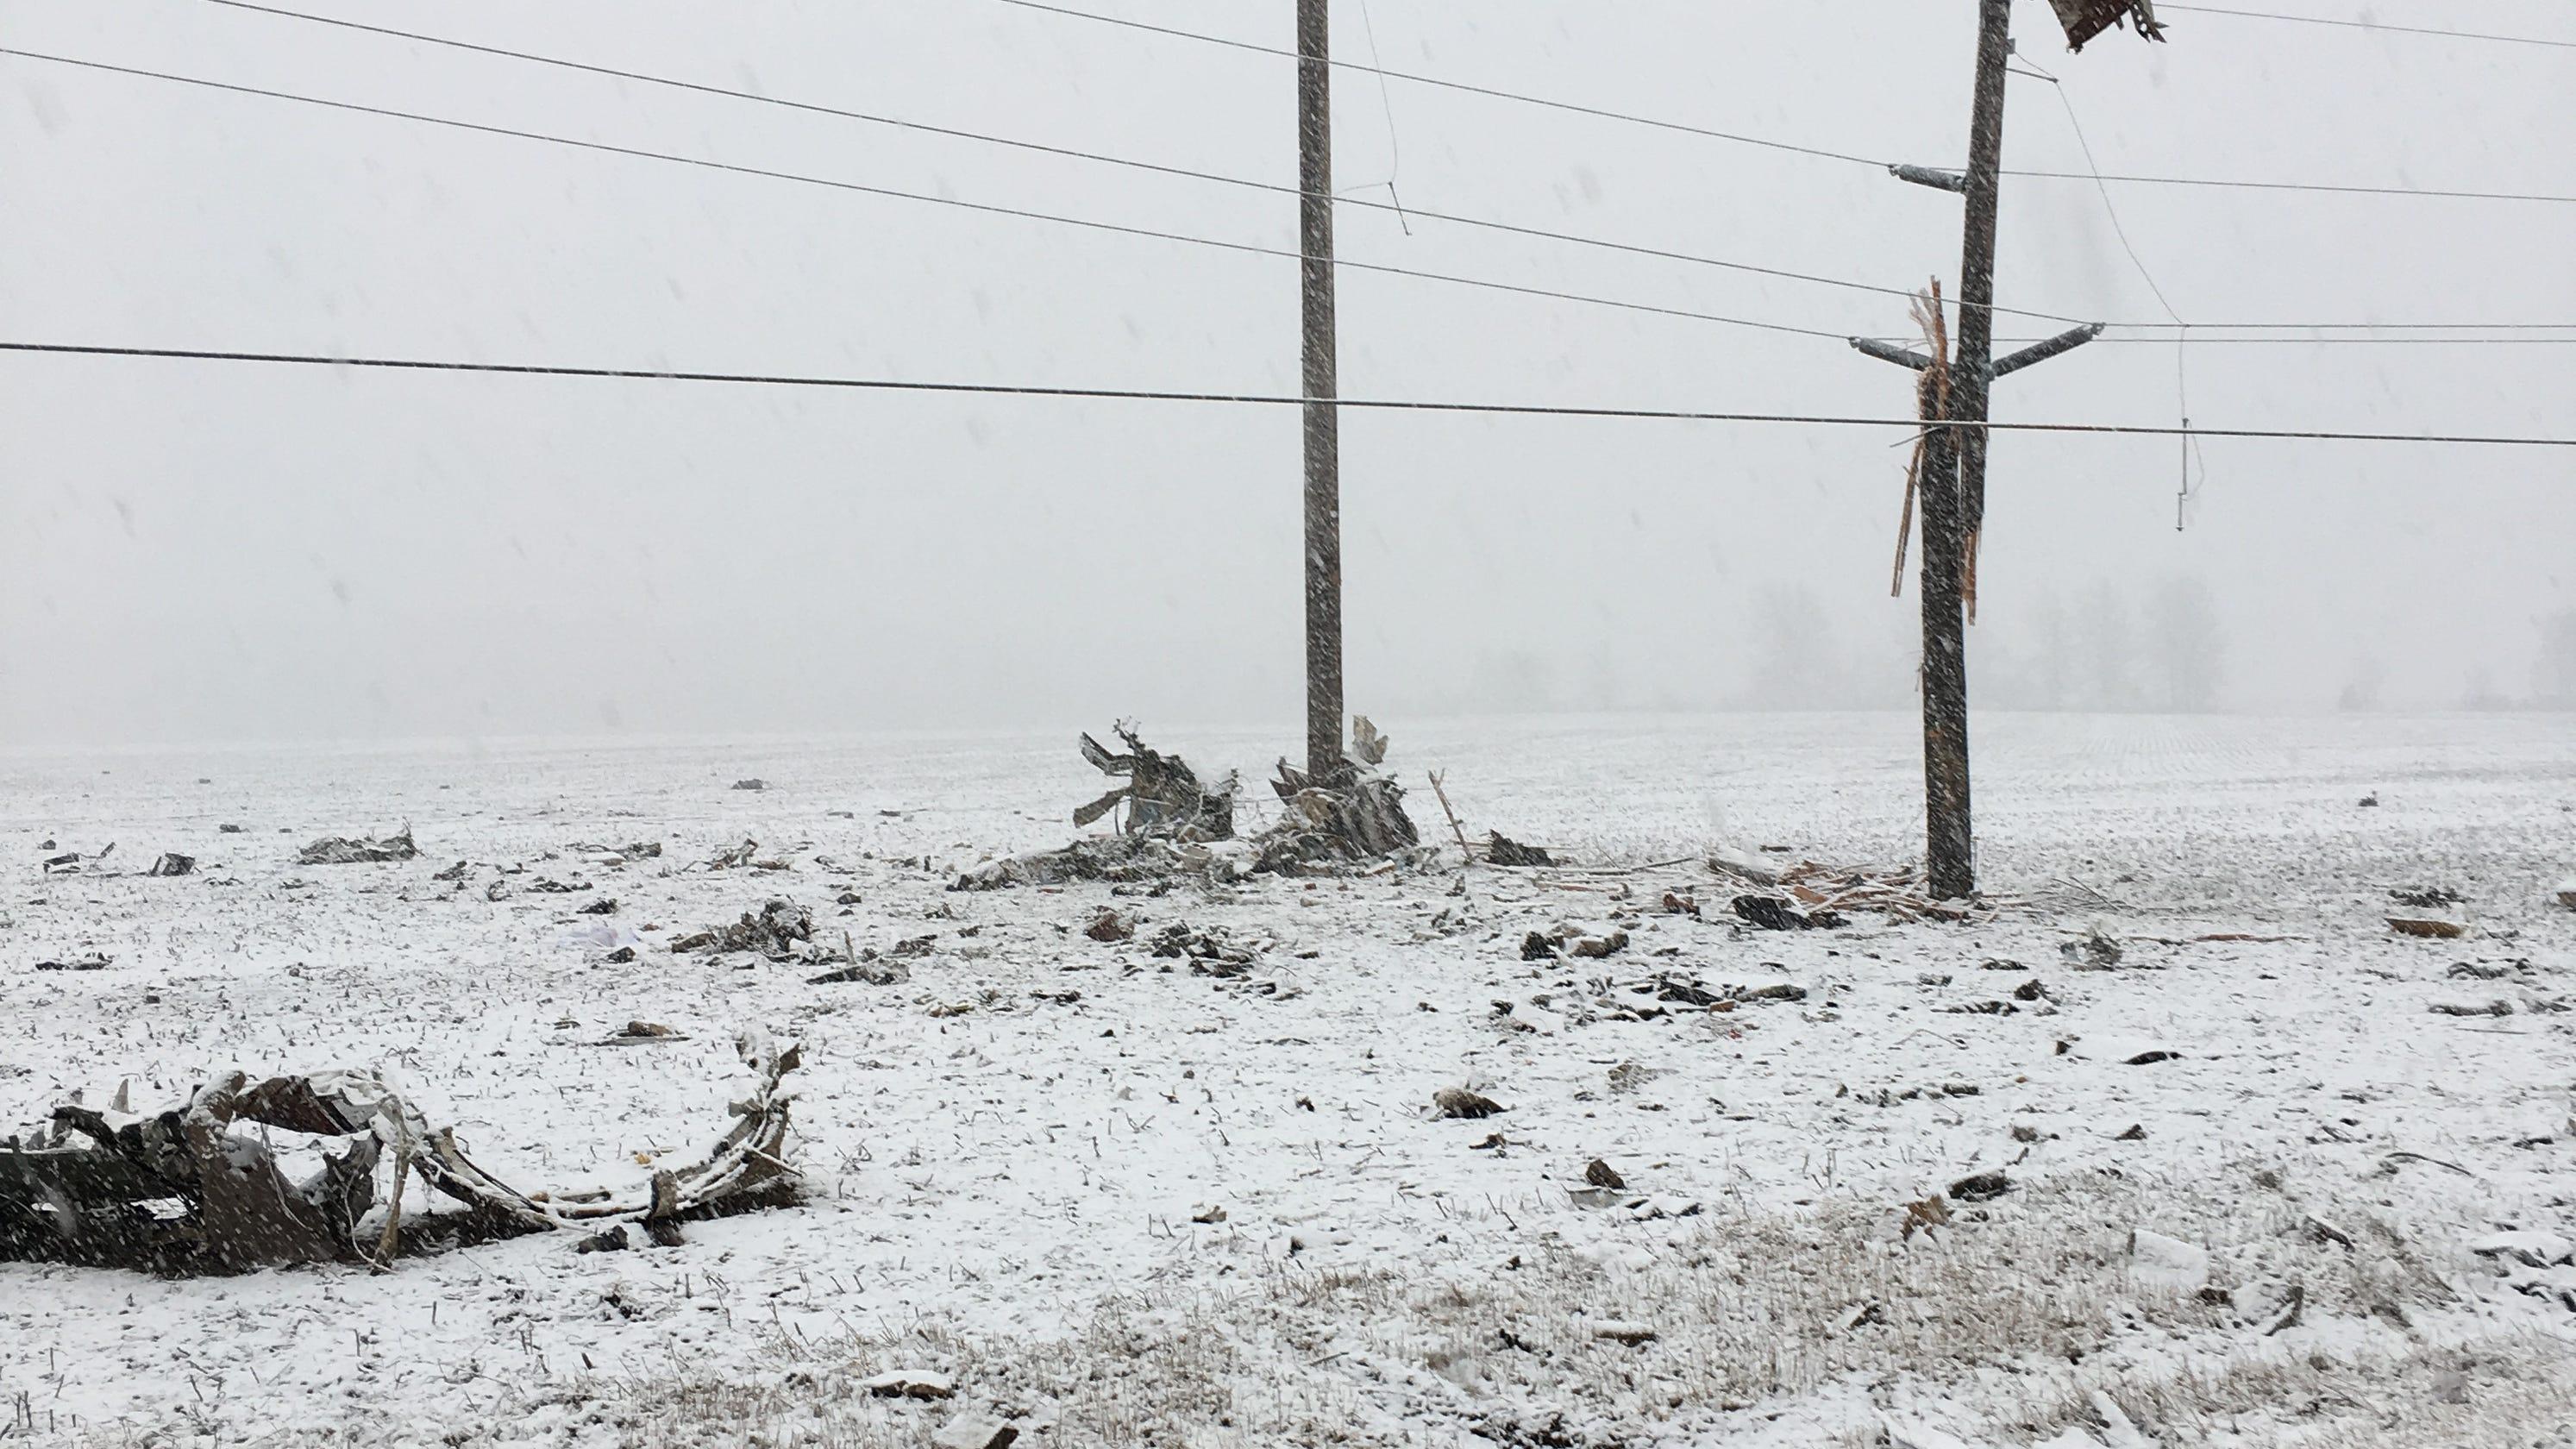 Matthew A  Hayden of Phoenix killed after plane crashes in